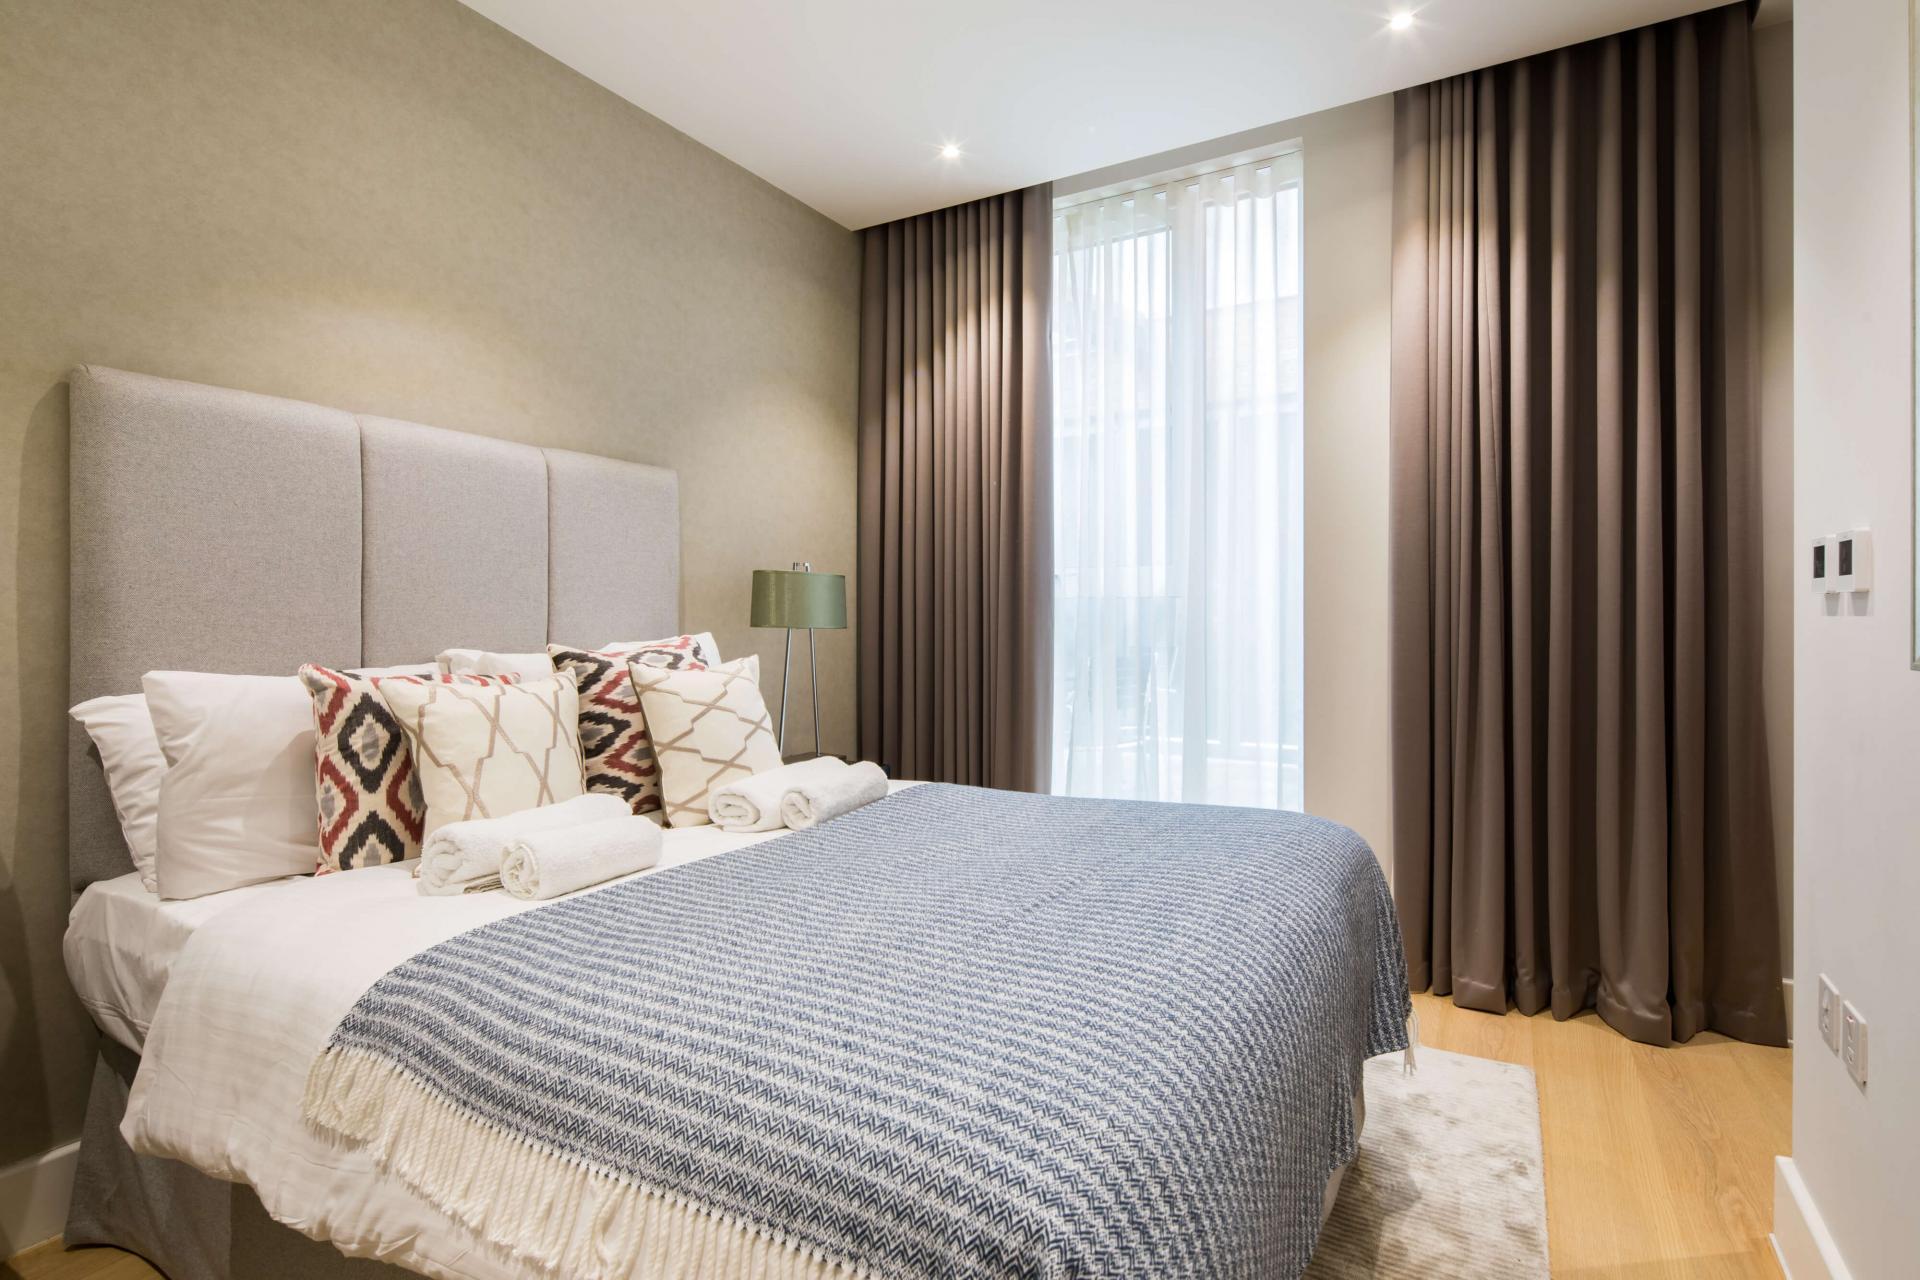 Bedroom at Logan Place Apartments, Kensington, London - Citybase Apartments